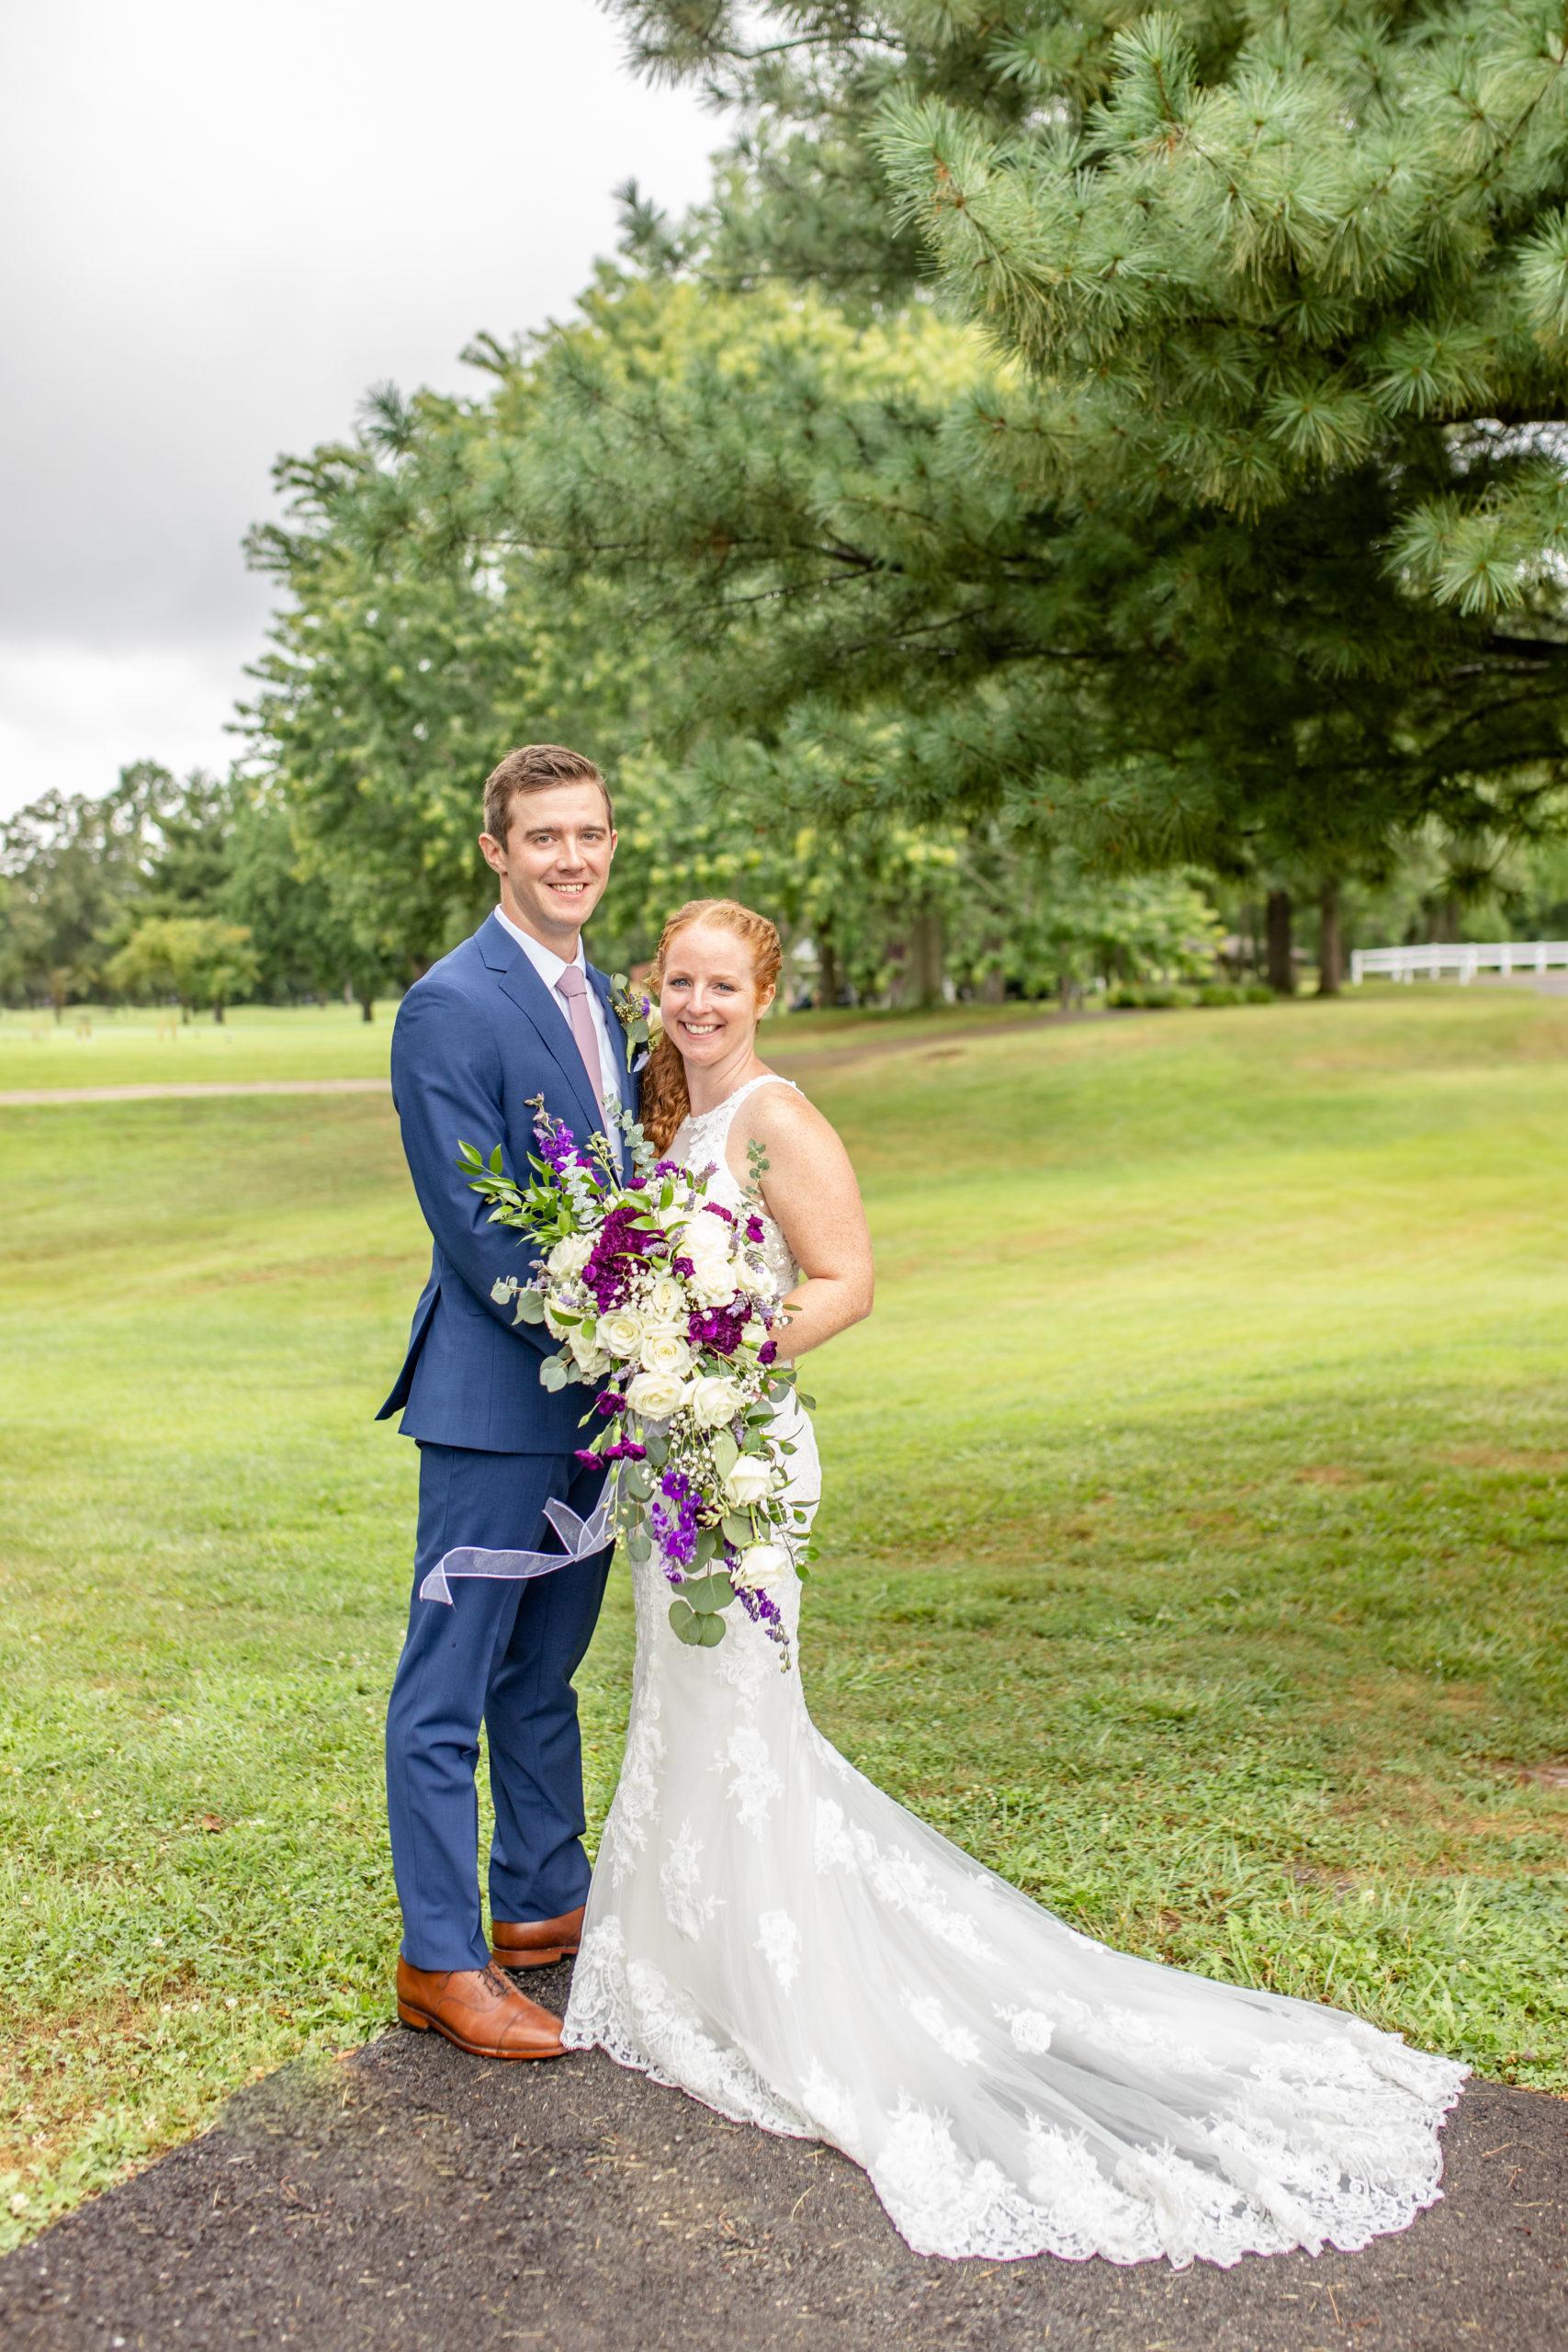 lakeside wedding, woodland wedding, lace wedding dress, blue tuxedo, bride and groom embracing, purple bouquet, purple wedding bouquet